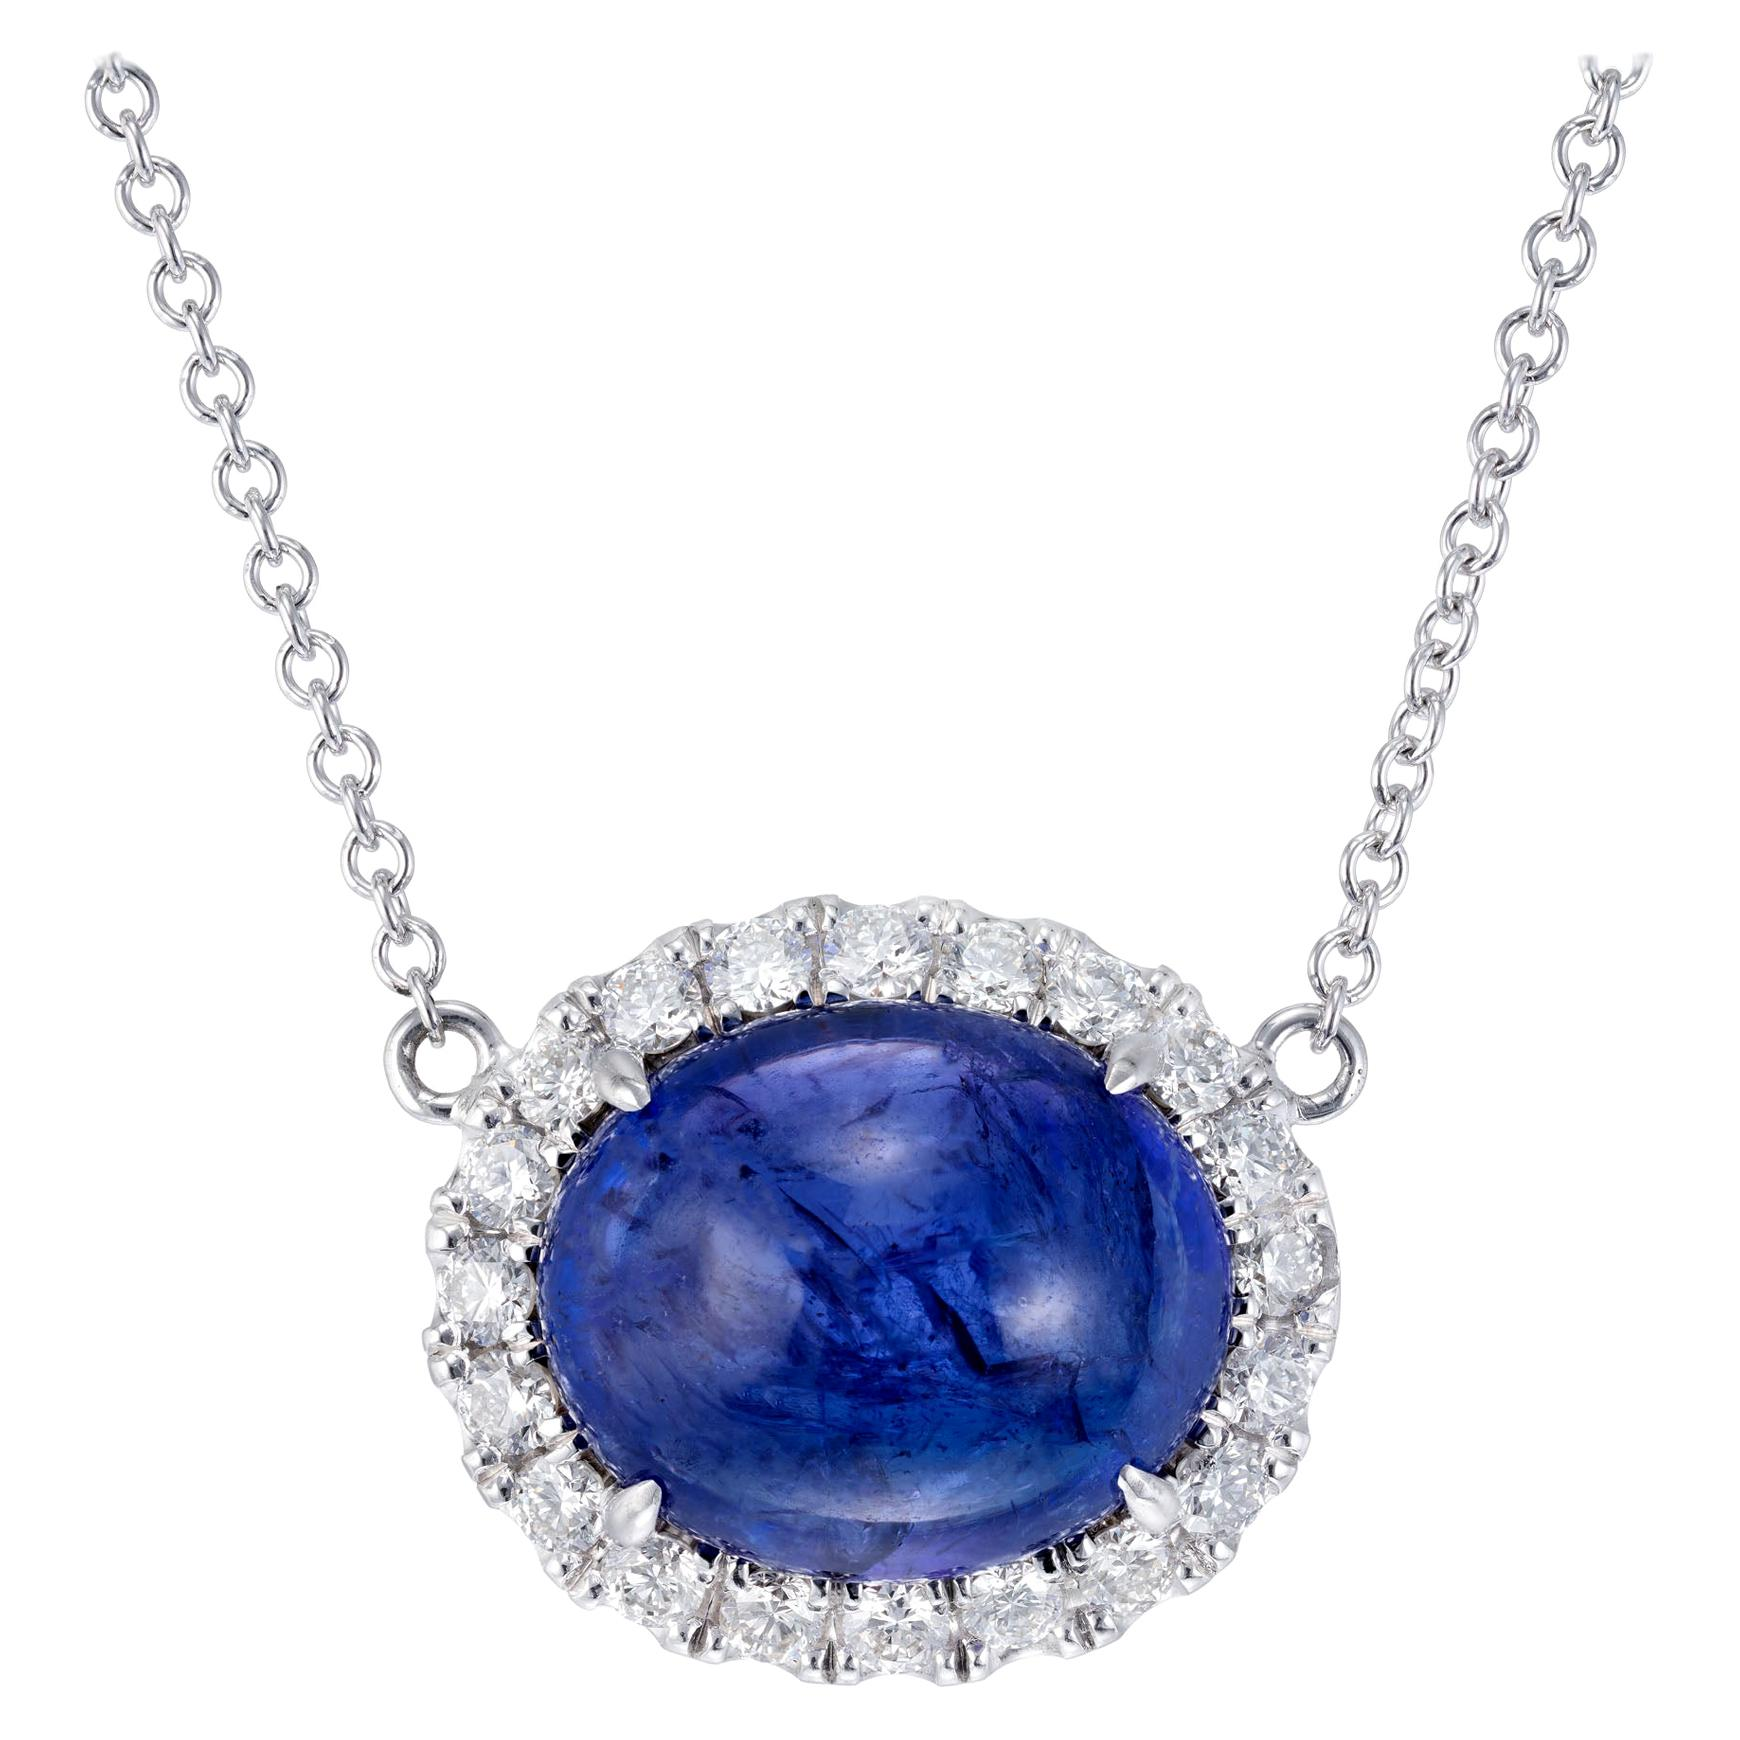 Peter Suchy 8.00 Carat Cabochon Tanzanite Diamond Halo Gold Pendant Necklace